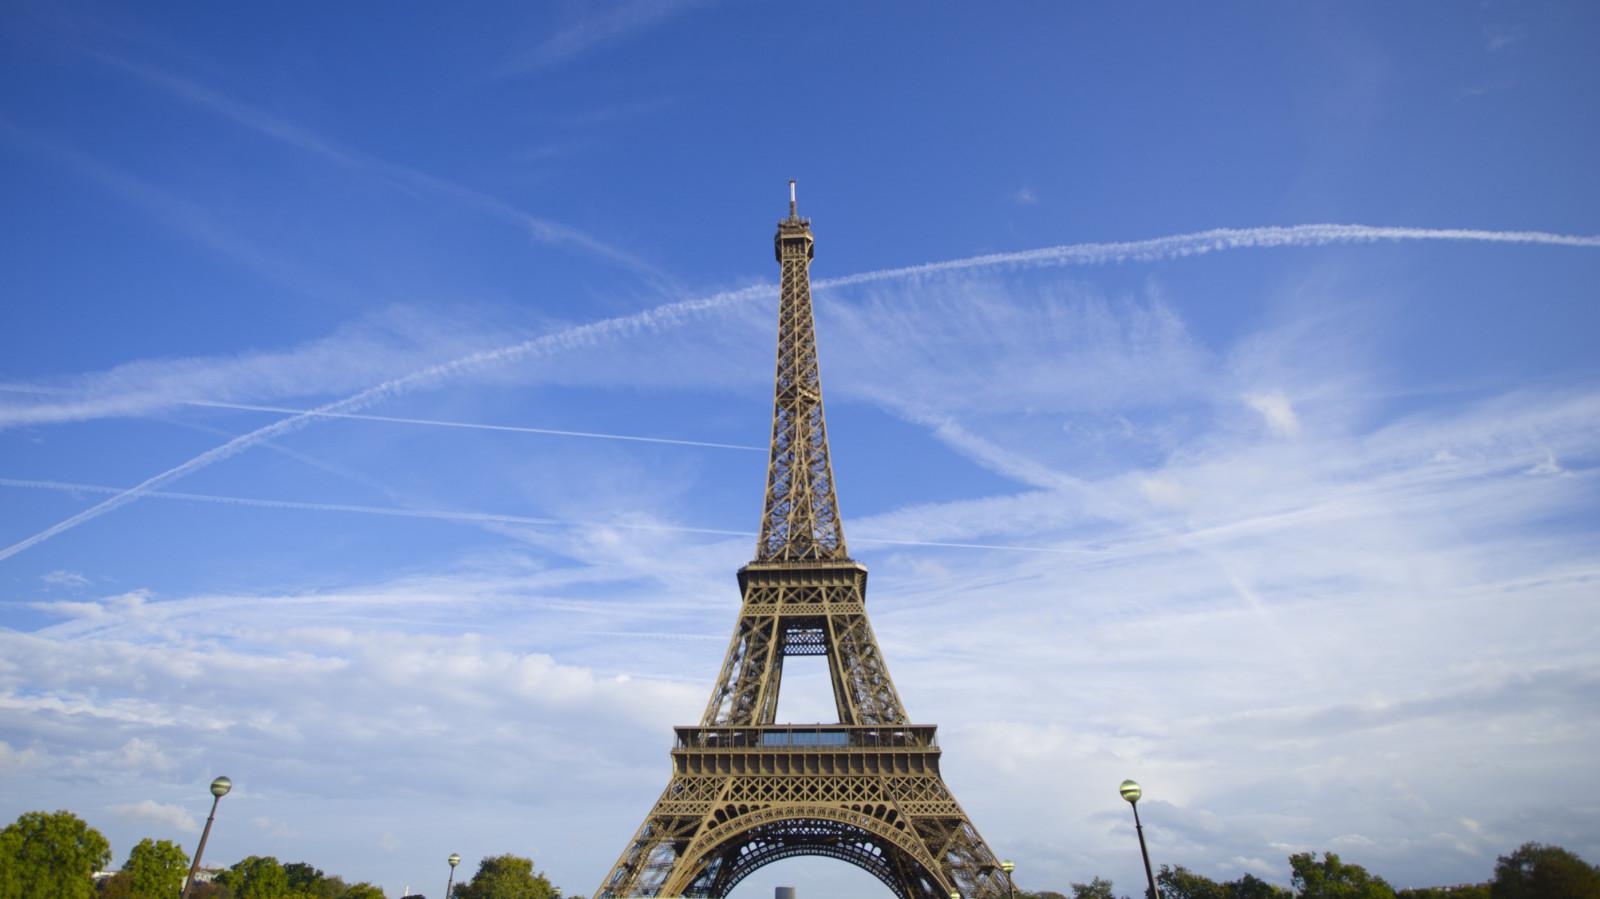 Wallpaper : Paris, France, tower, eiffeltower, eiffel, latoureiffel ...